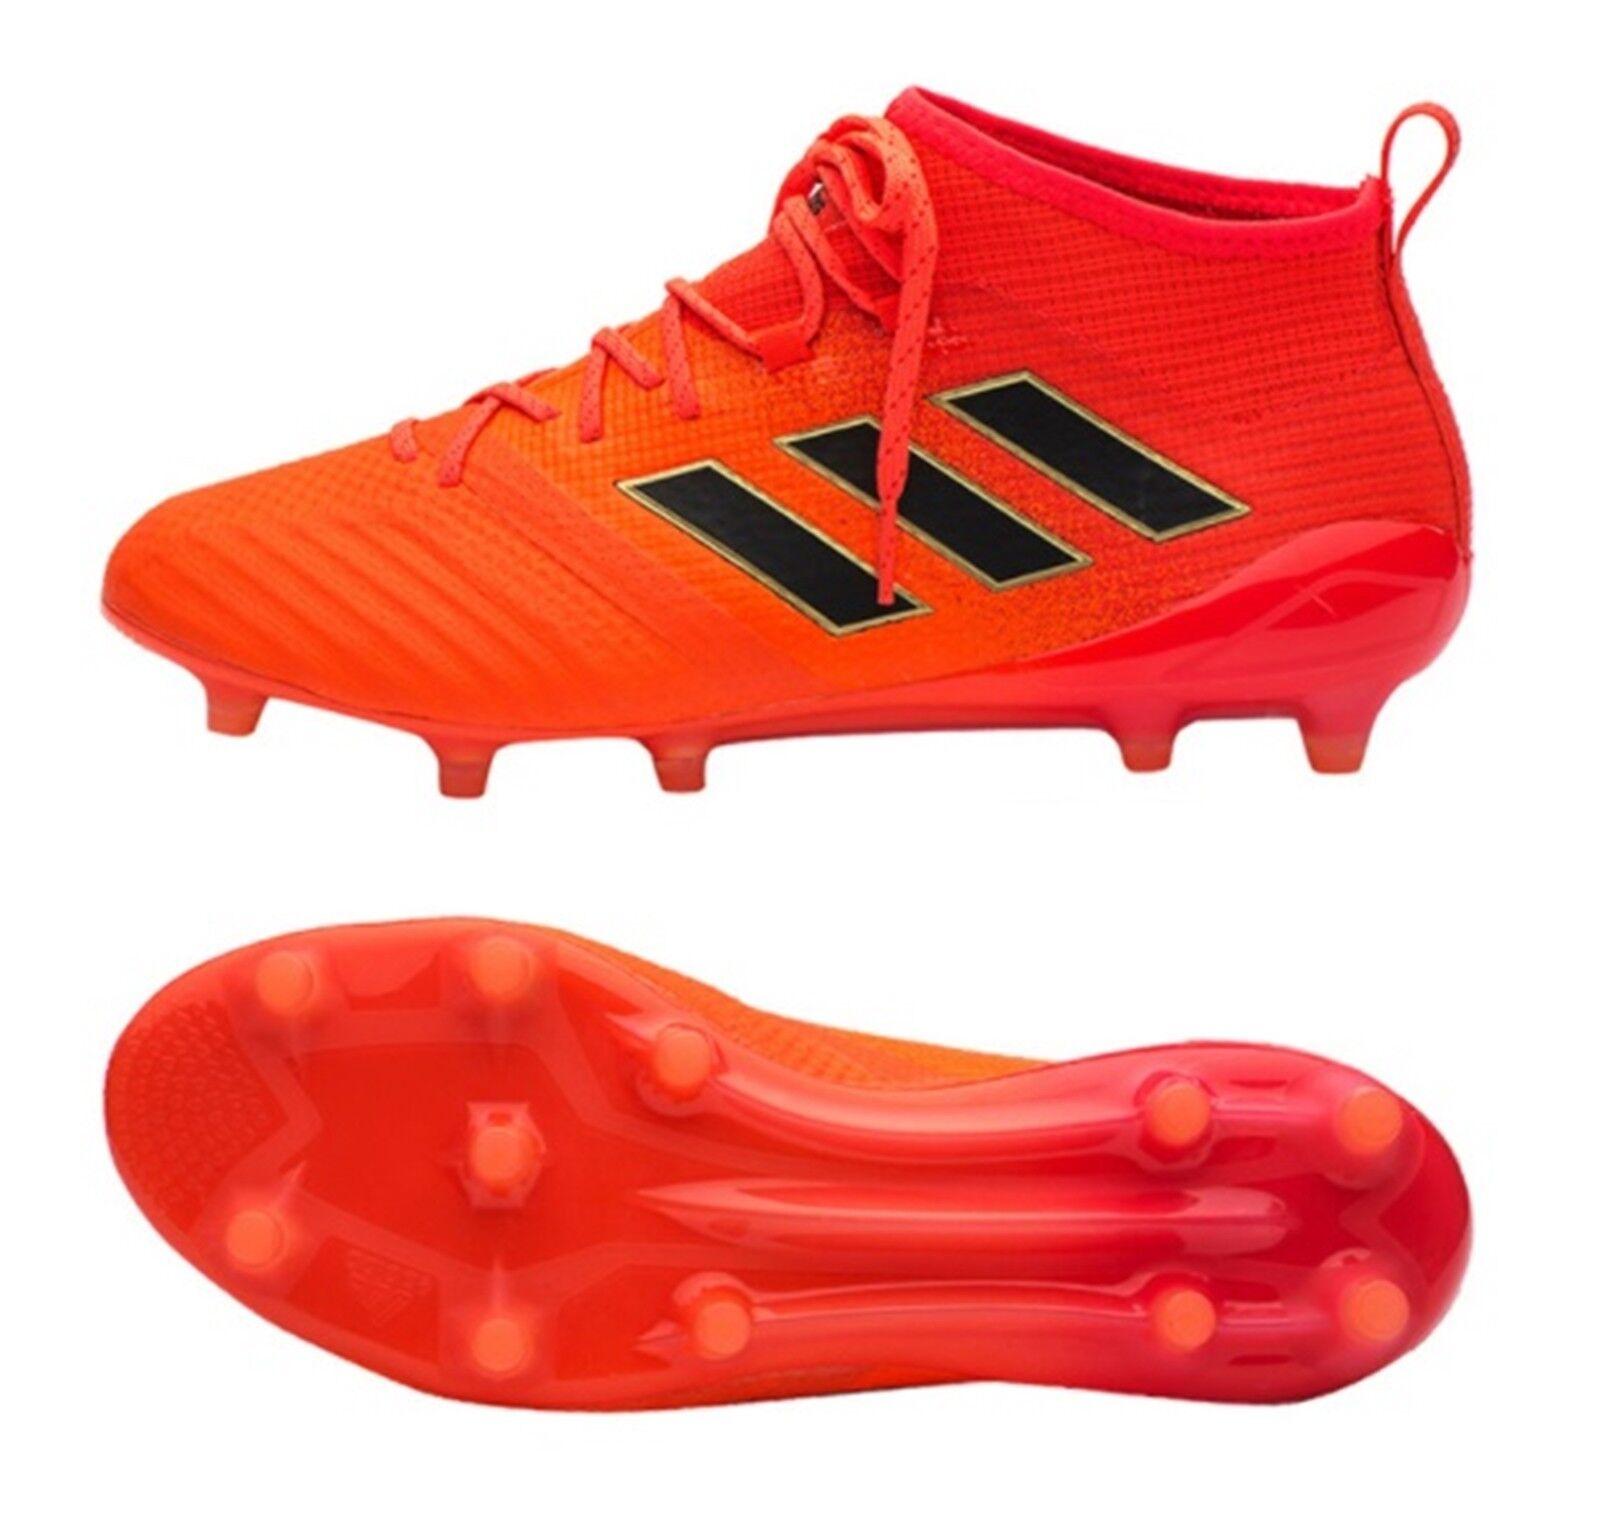 Adidas Hombres Ace 17.1 FG Botines Zapatos De Futsal Fútbol Fútbol Rojo Gimnasio Spike S77036